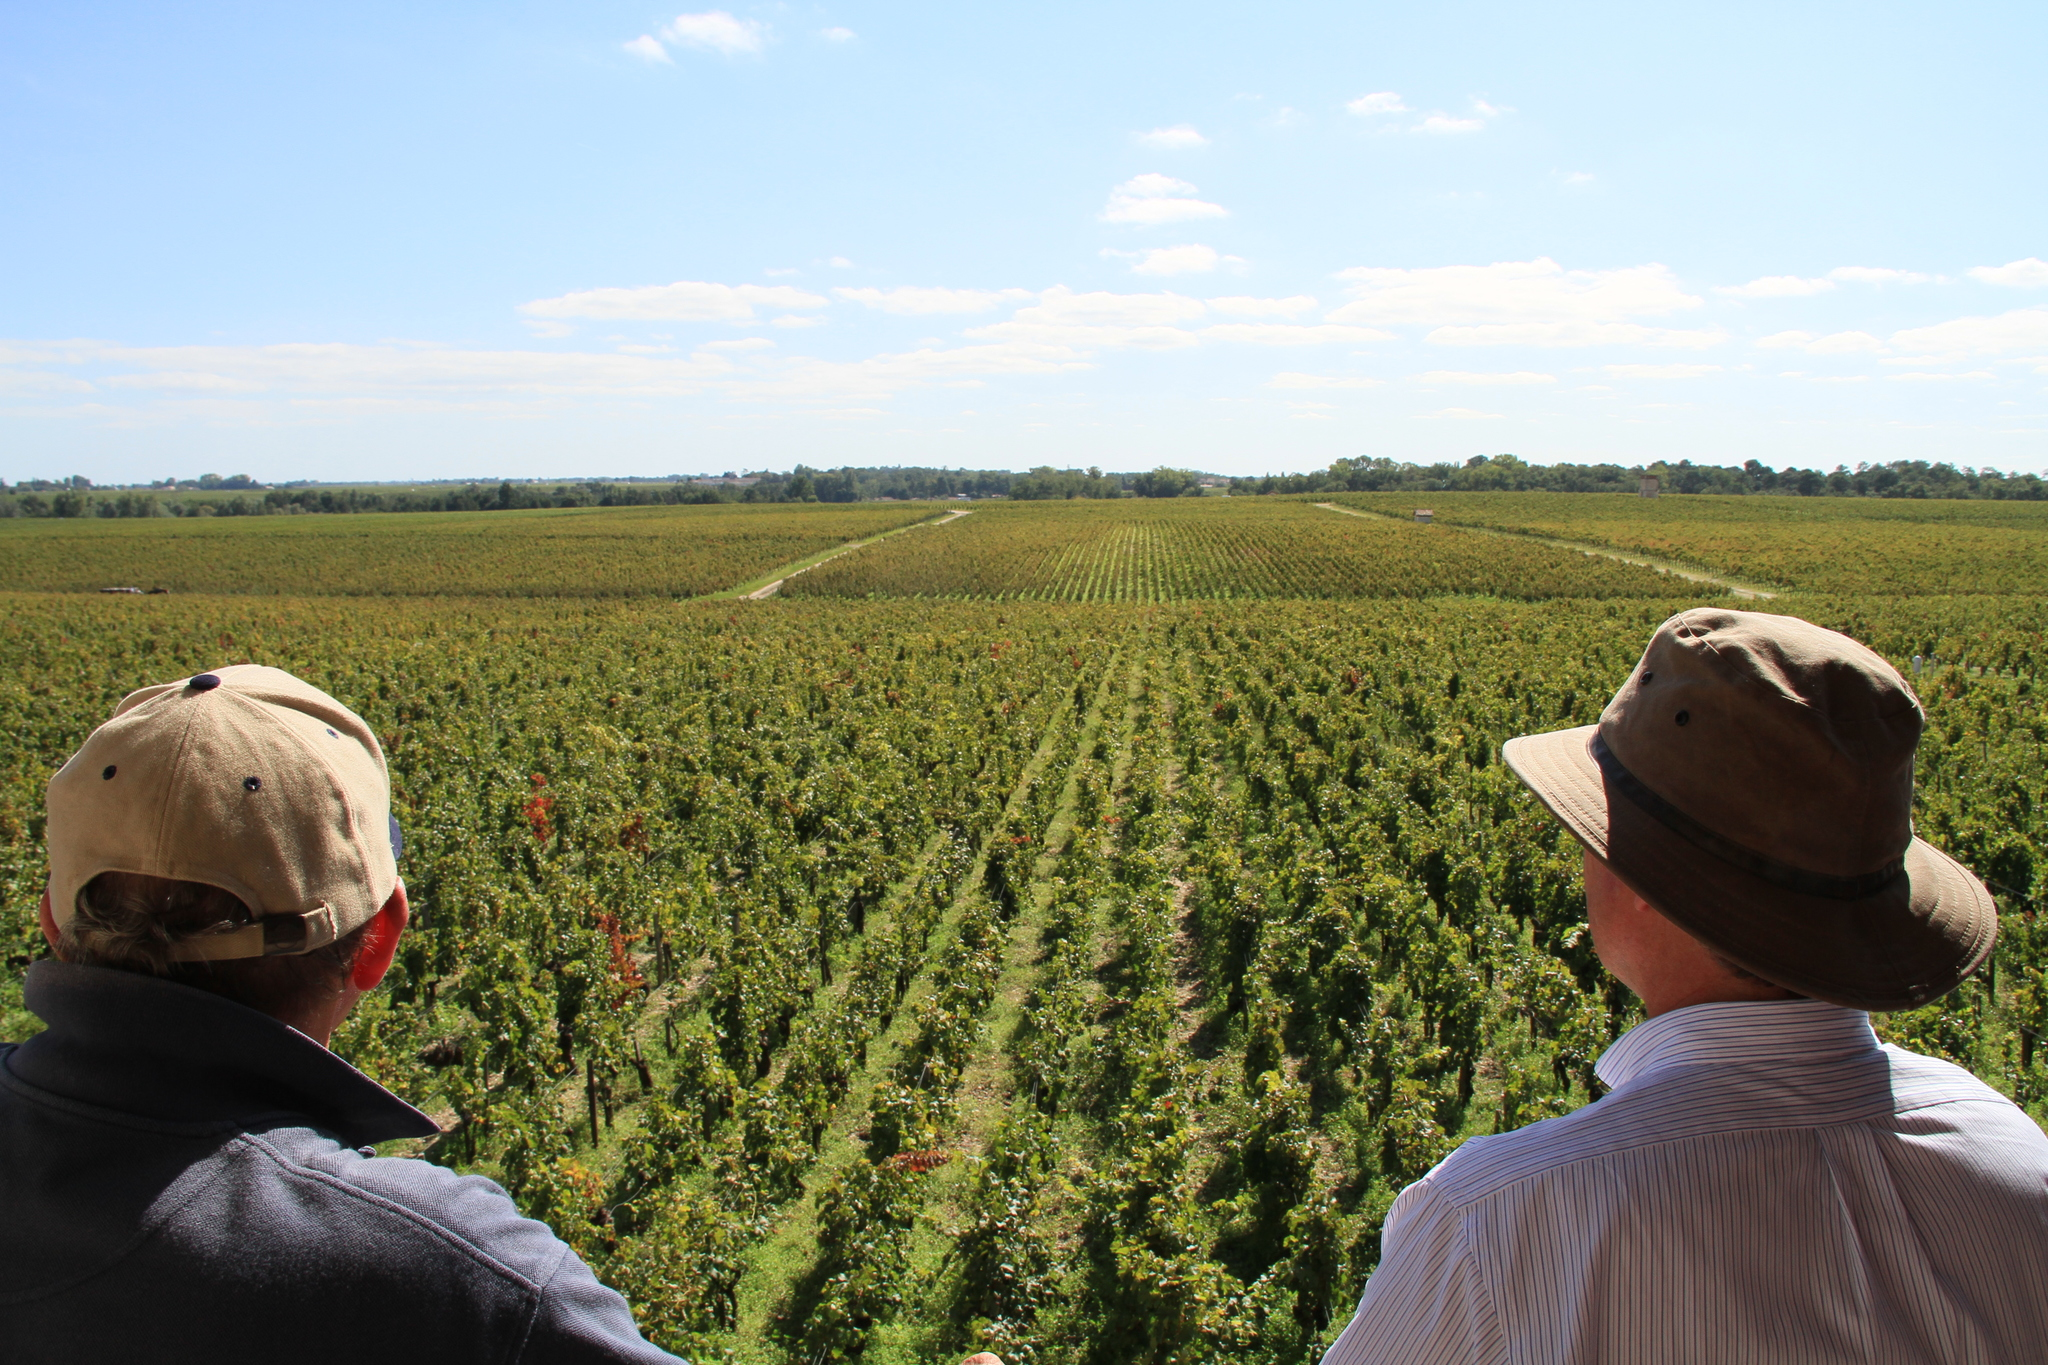 Still of The Vines in Pamisimas del vyno (2013)